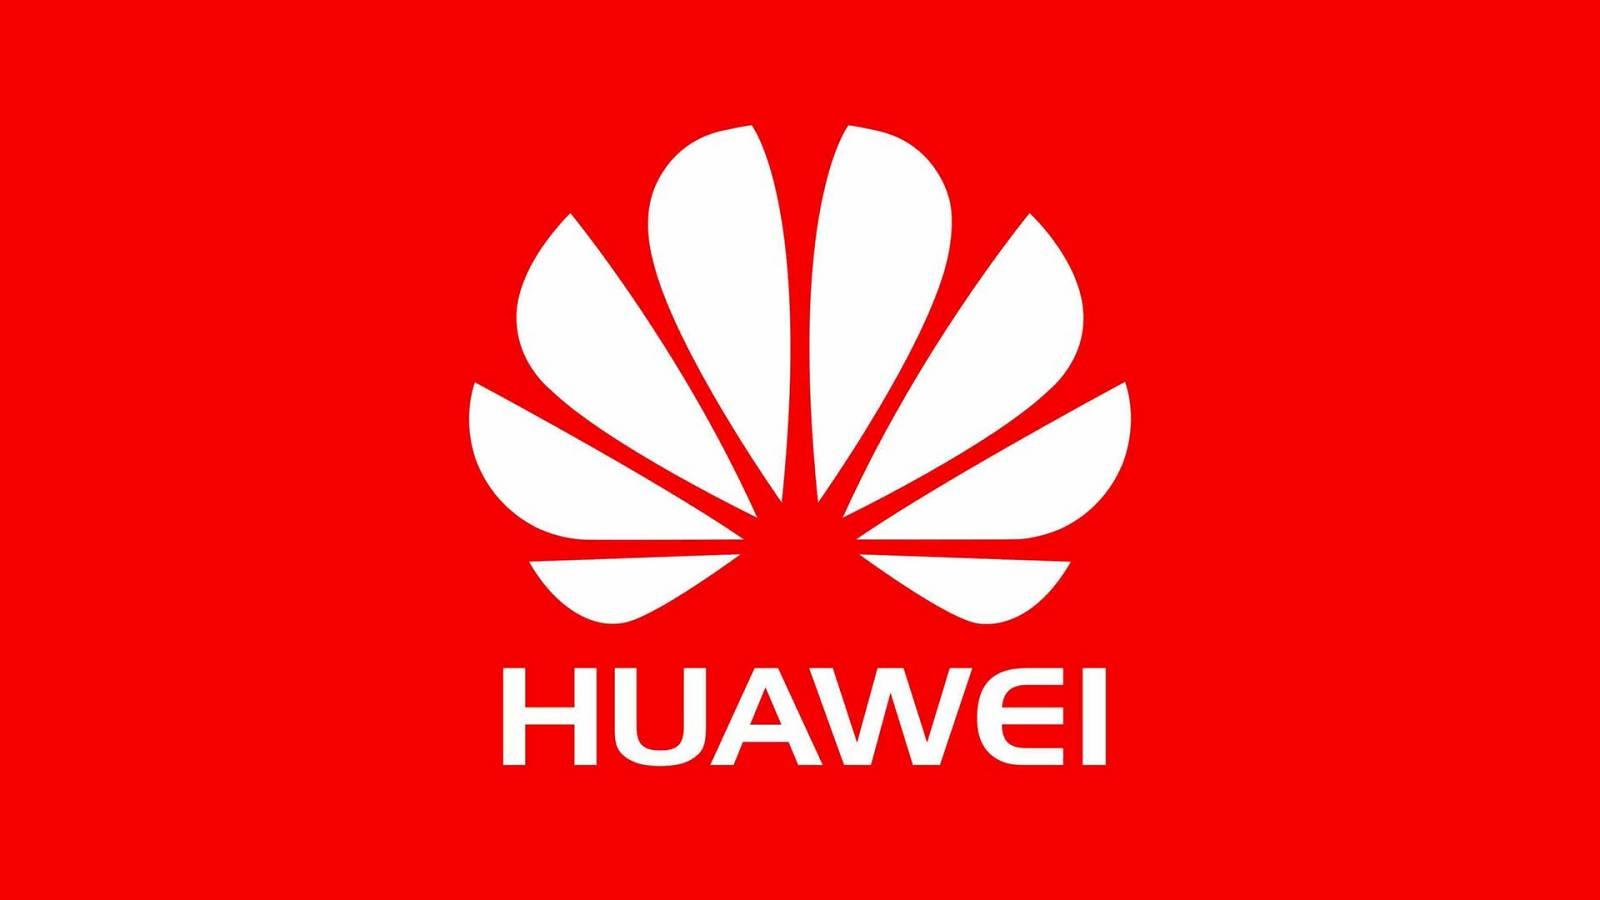 Huawei distributiva